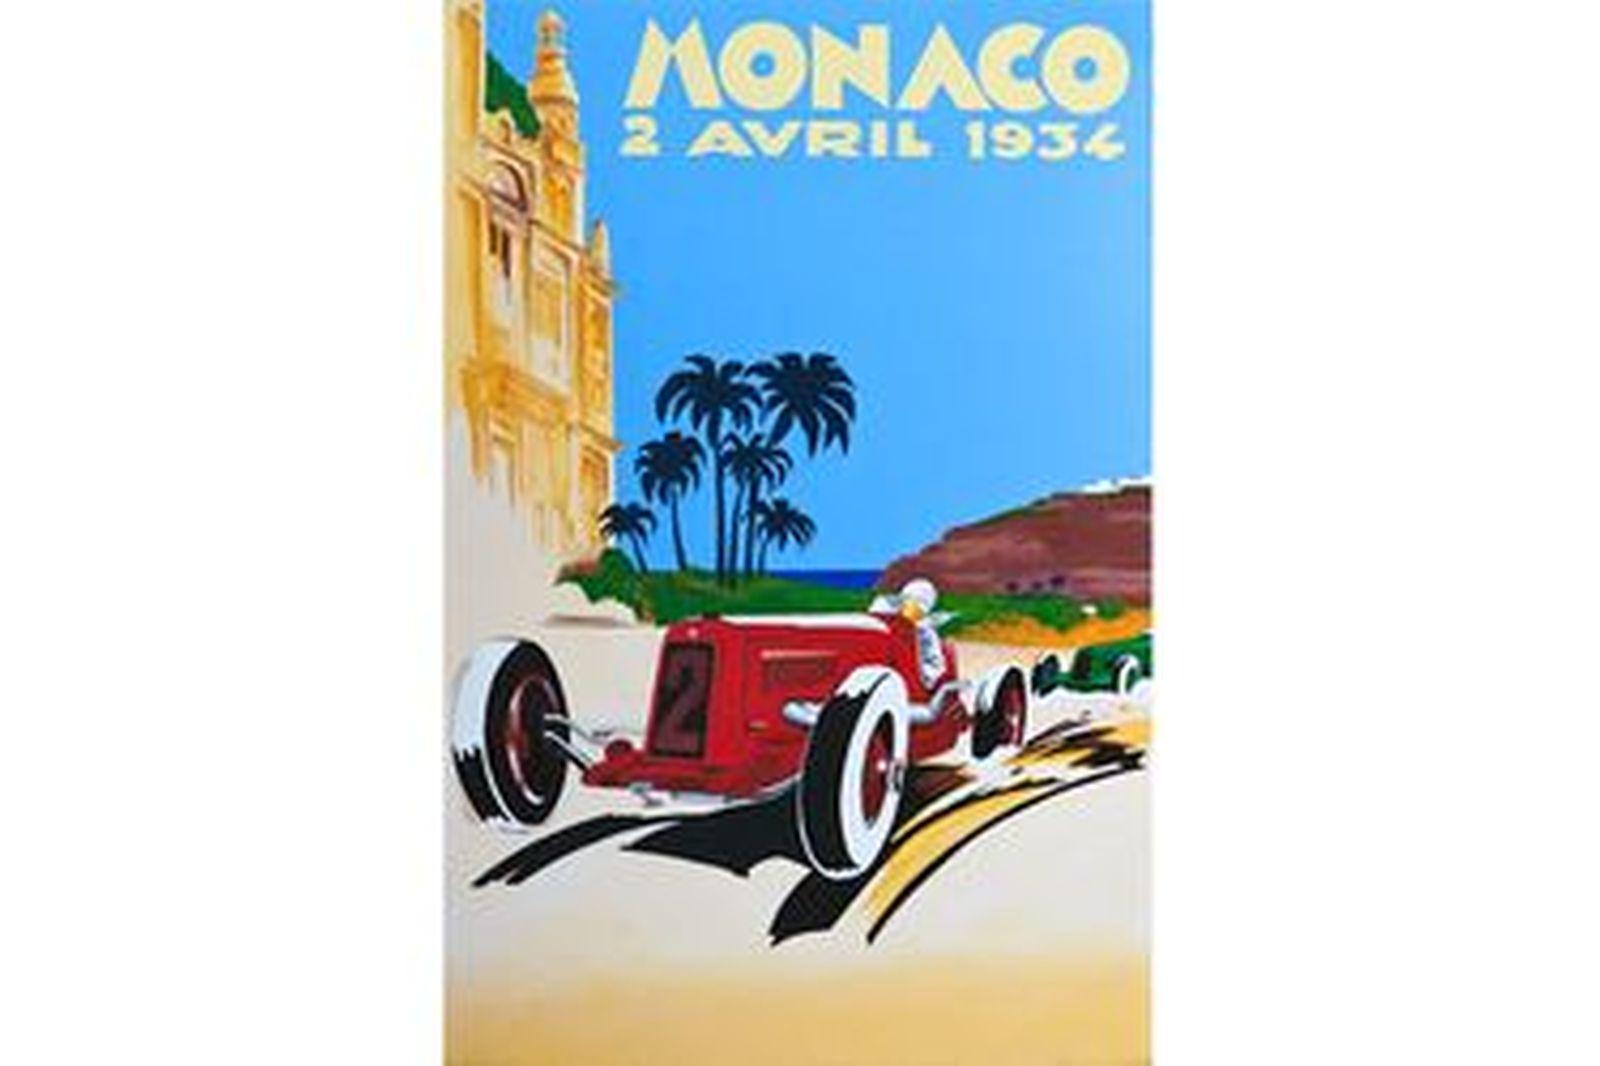 Framed Monaco Print 1934